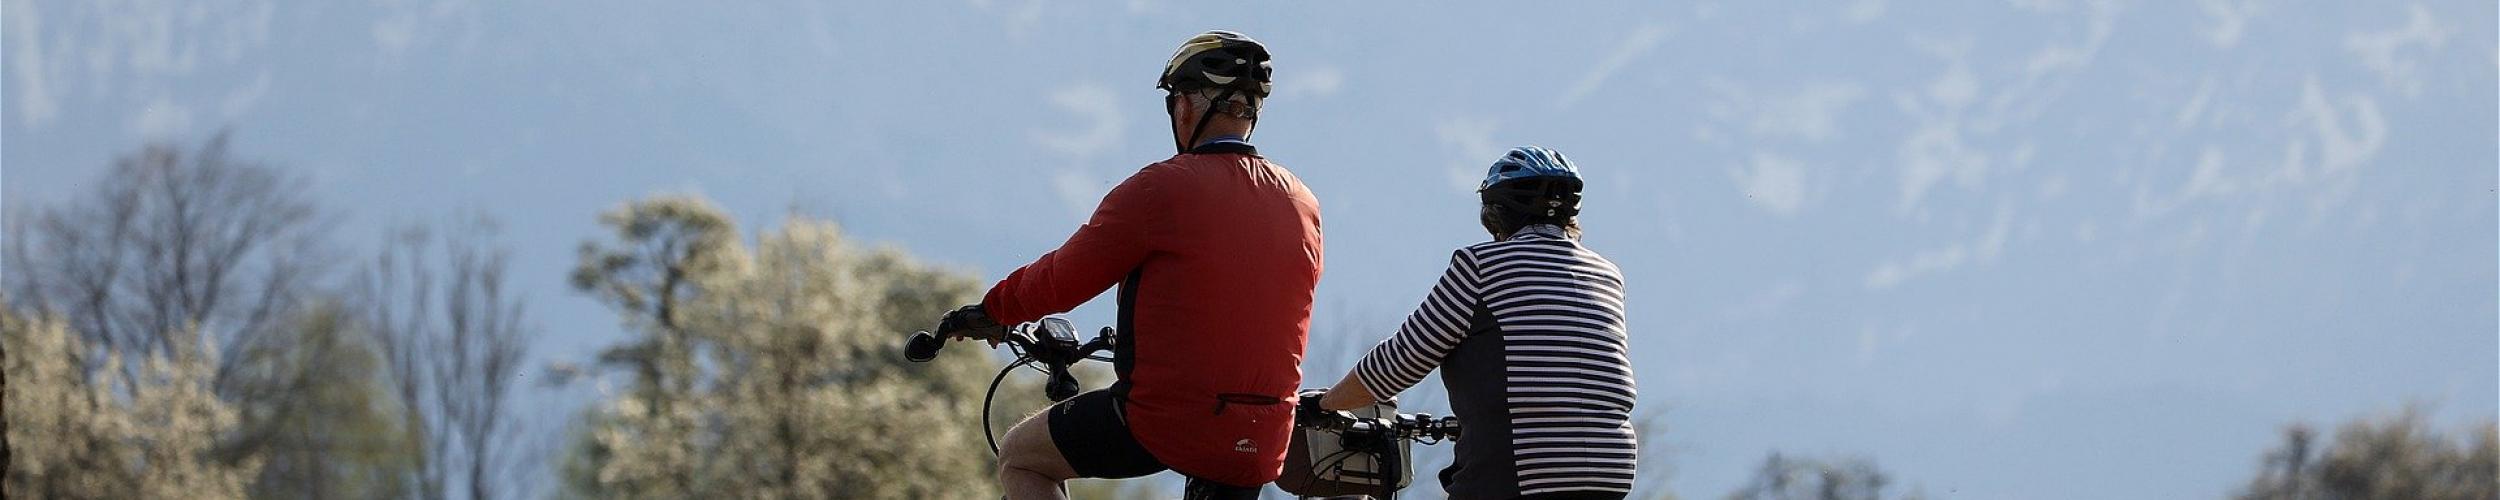 Vrije fietstocht